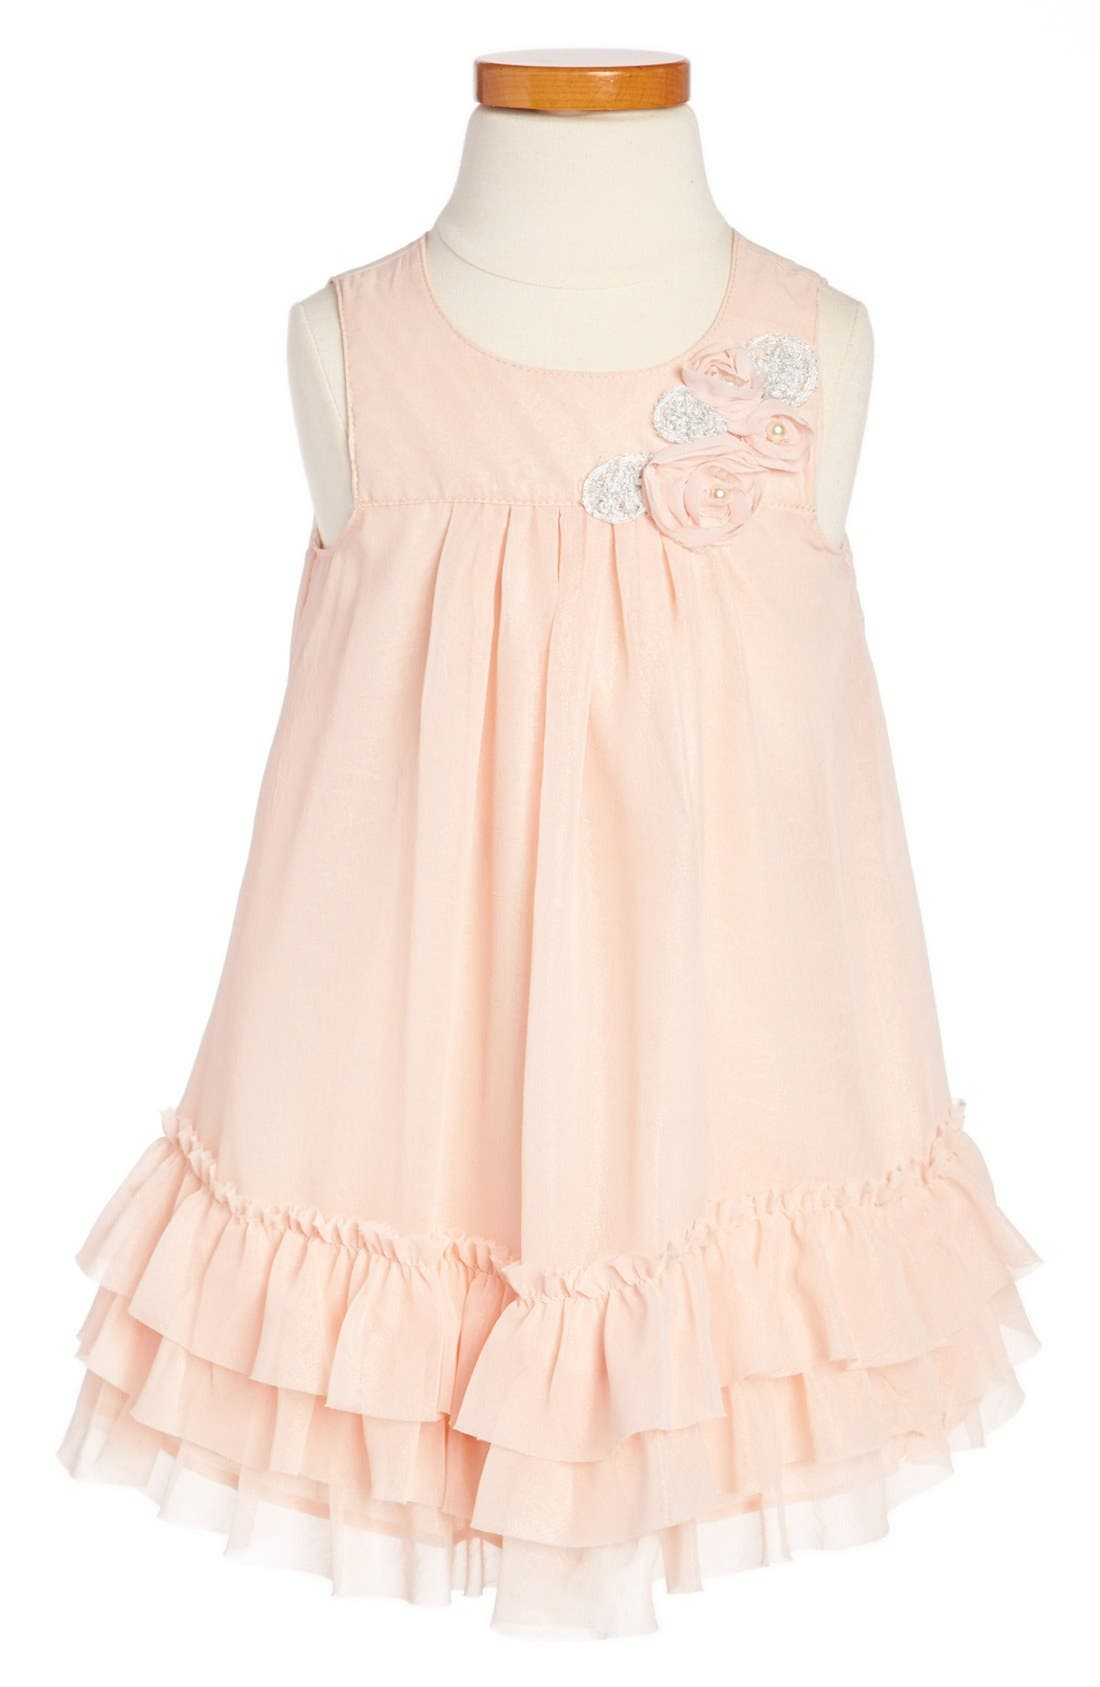 Alternate Image 1 Selected - Pippa & Julie Ruffle Dress (Toddler Girls)